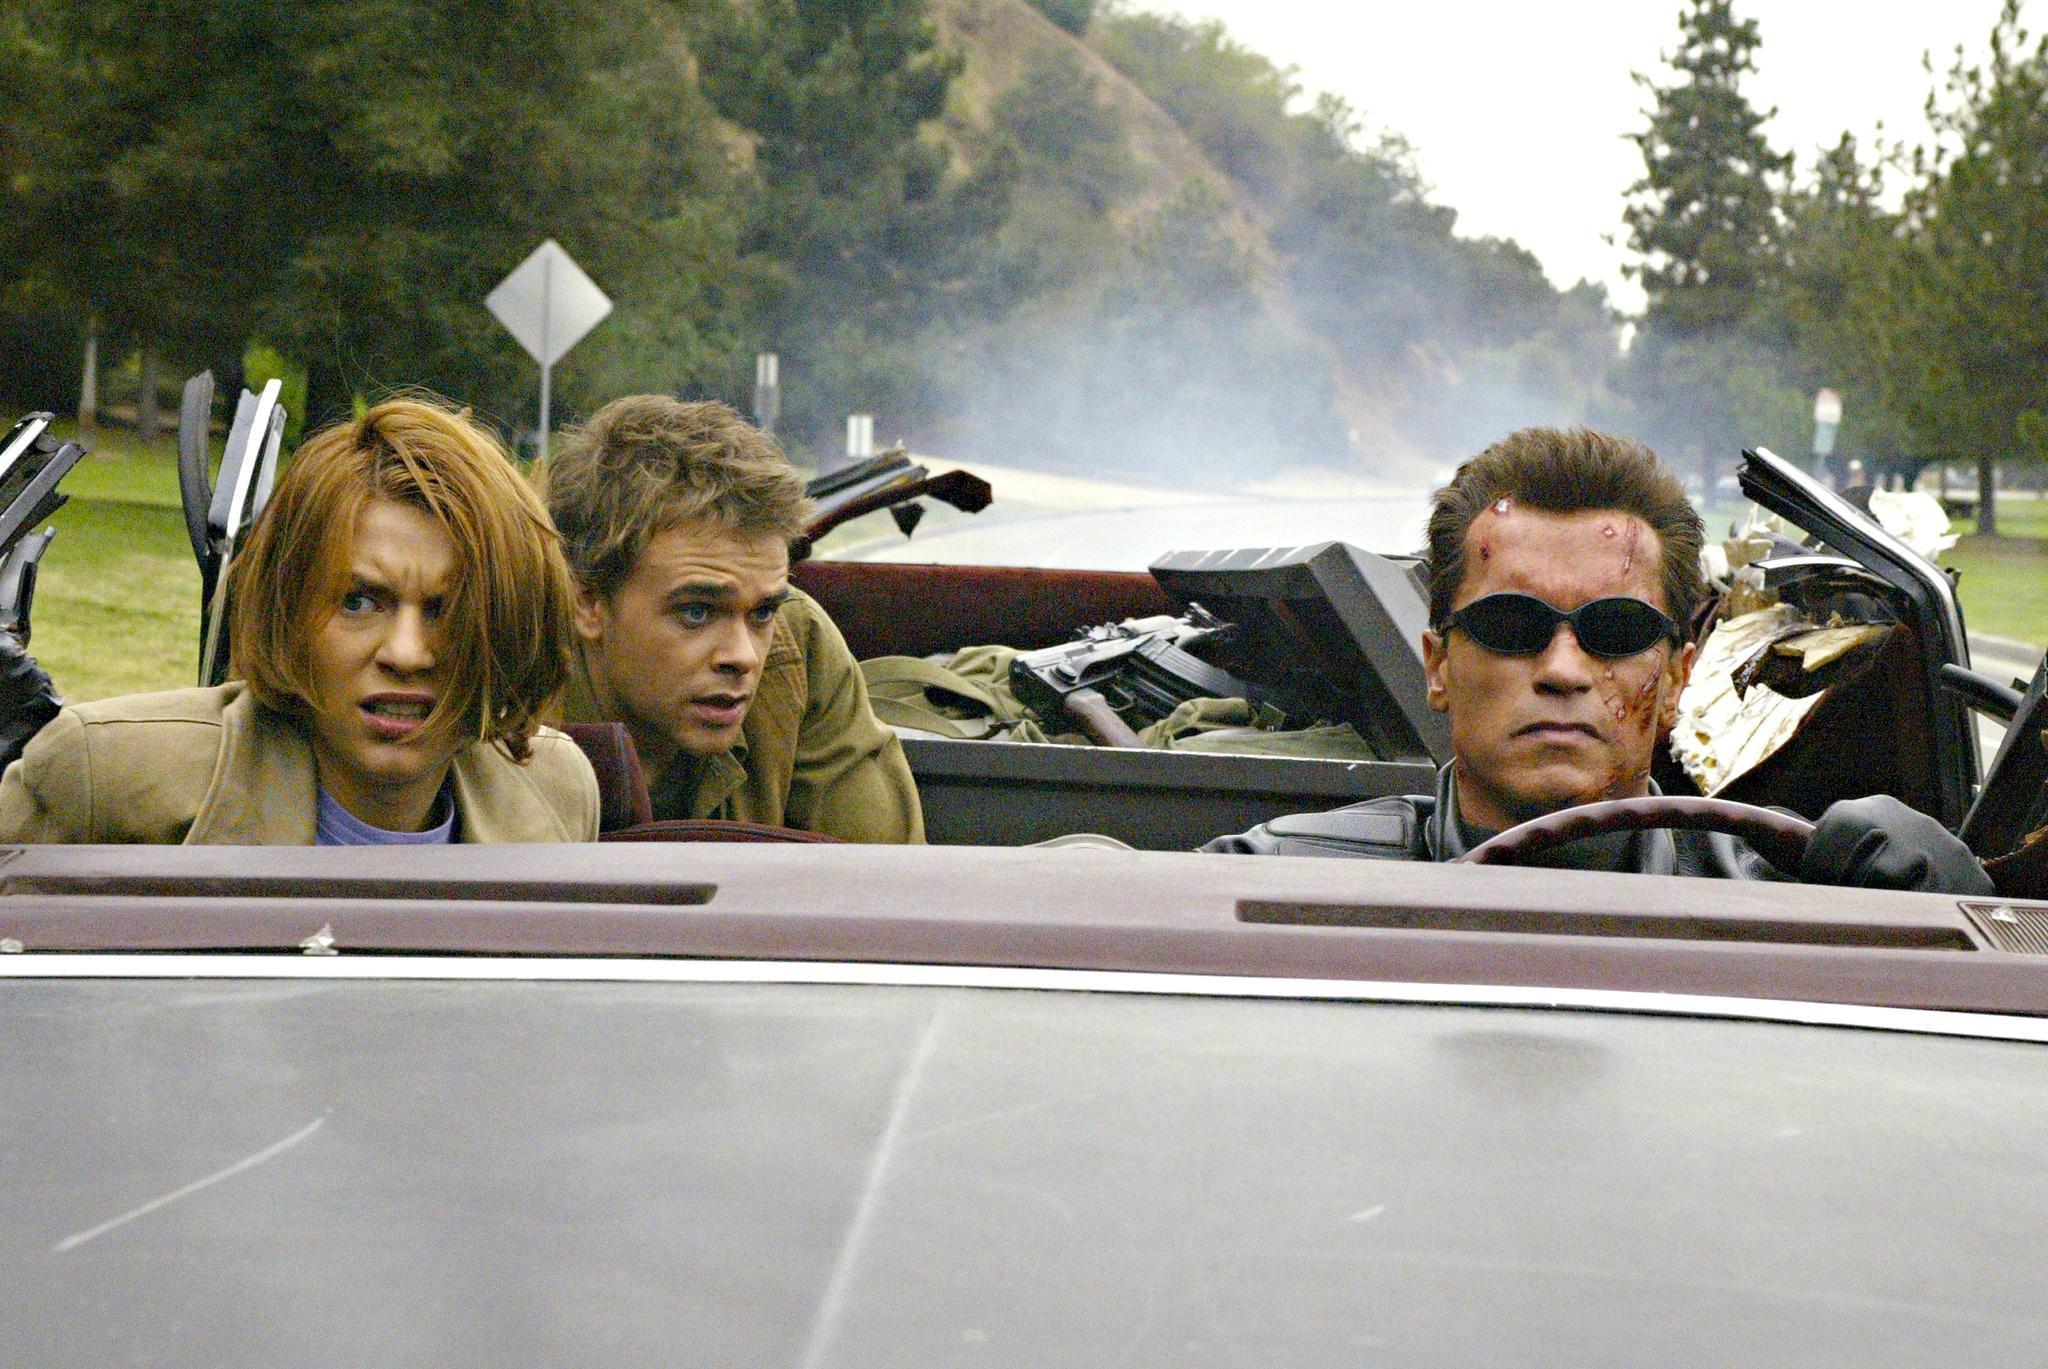 Terminator 3 soulevement machines claire danes arnold schwarzenegger nick stahl